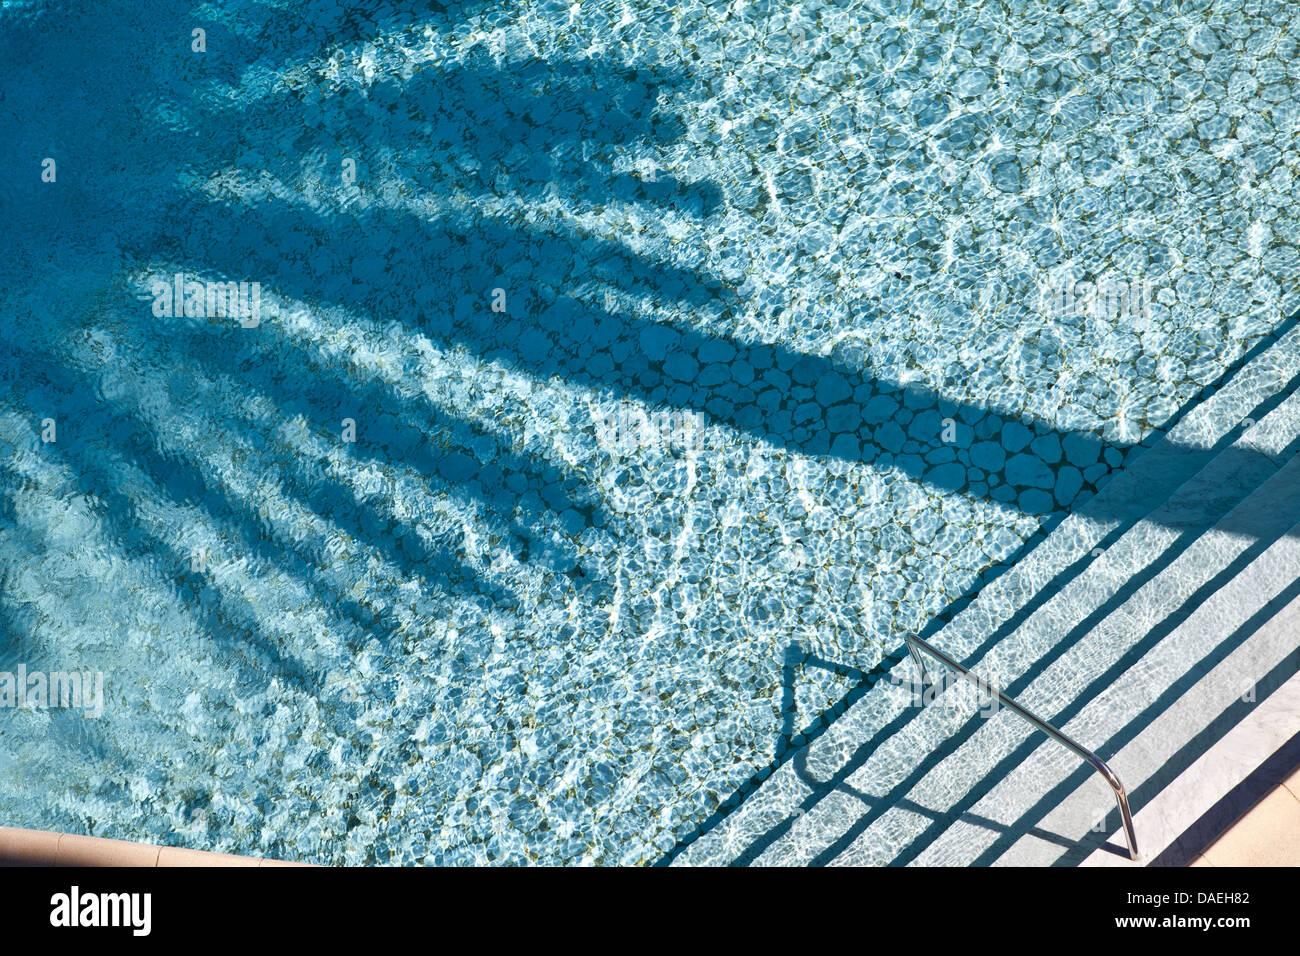 Piscina con Palm tree ombra in piscina. Immagini Stock